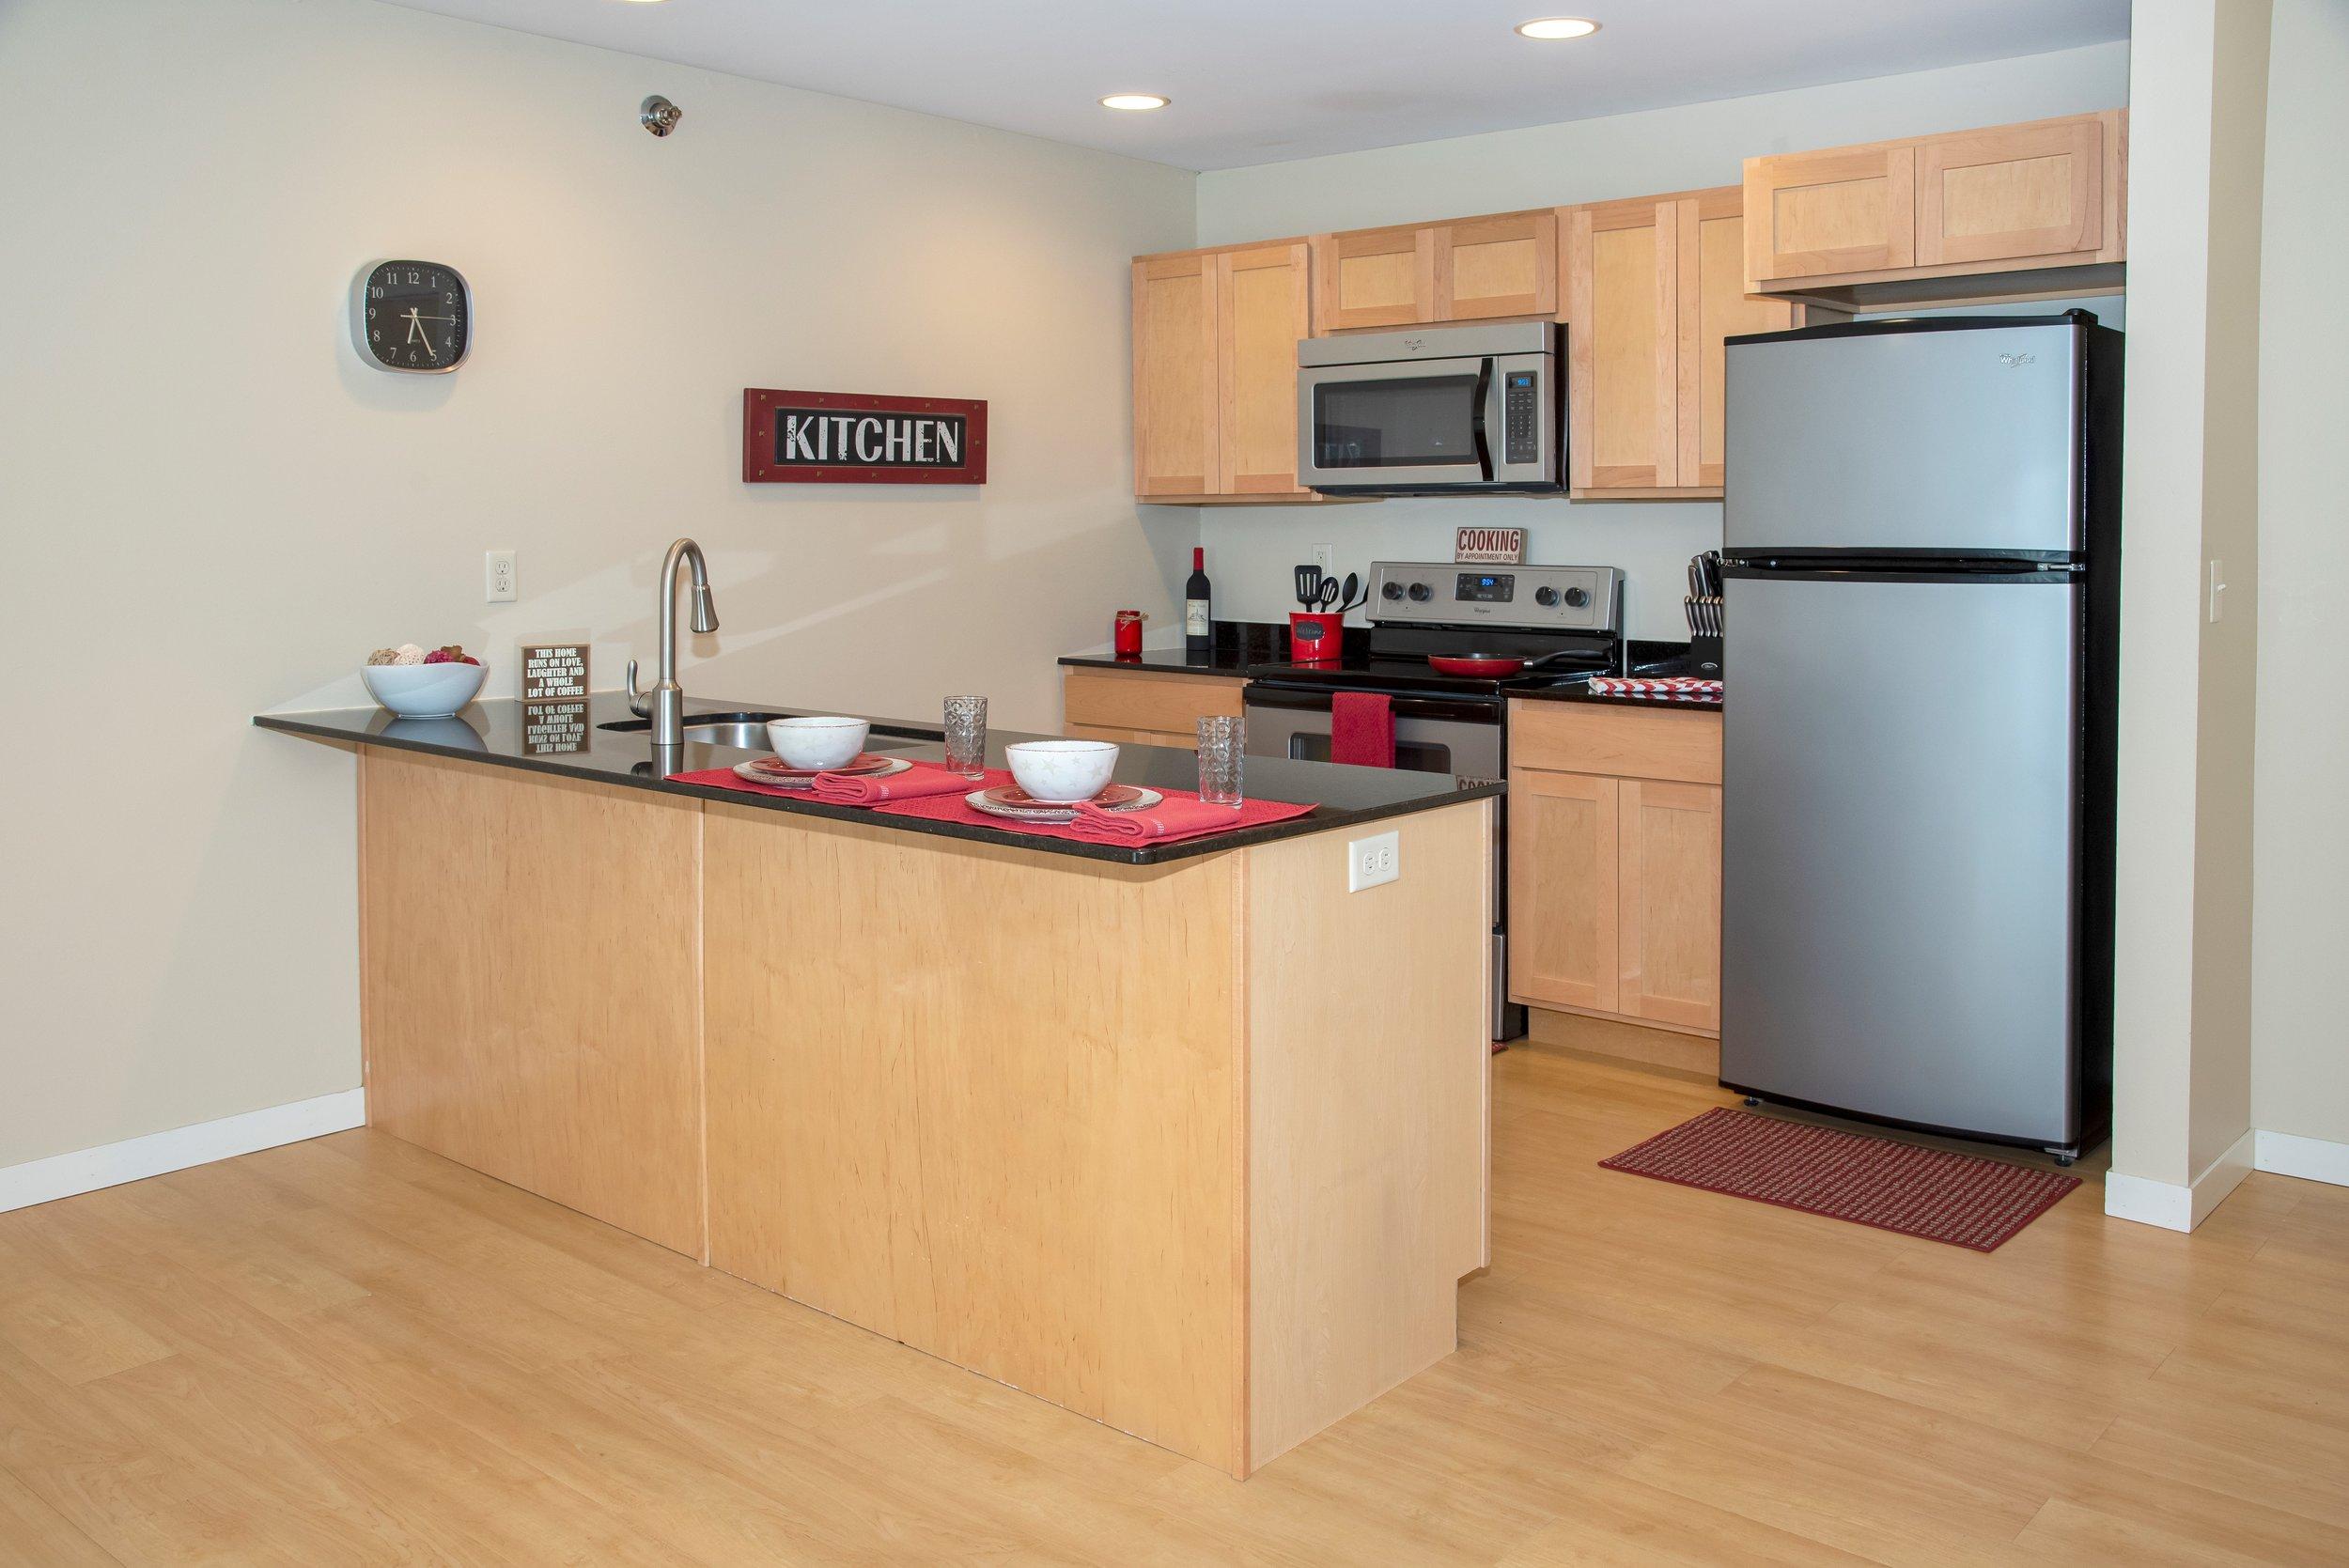 02 Stylish Kitchens with Large Breakfast Bar.jpg